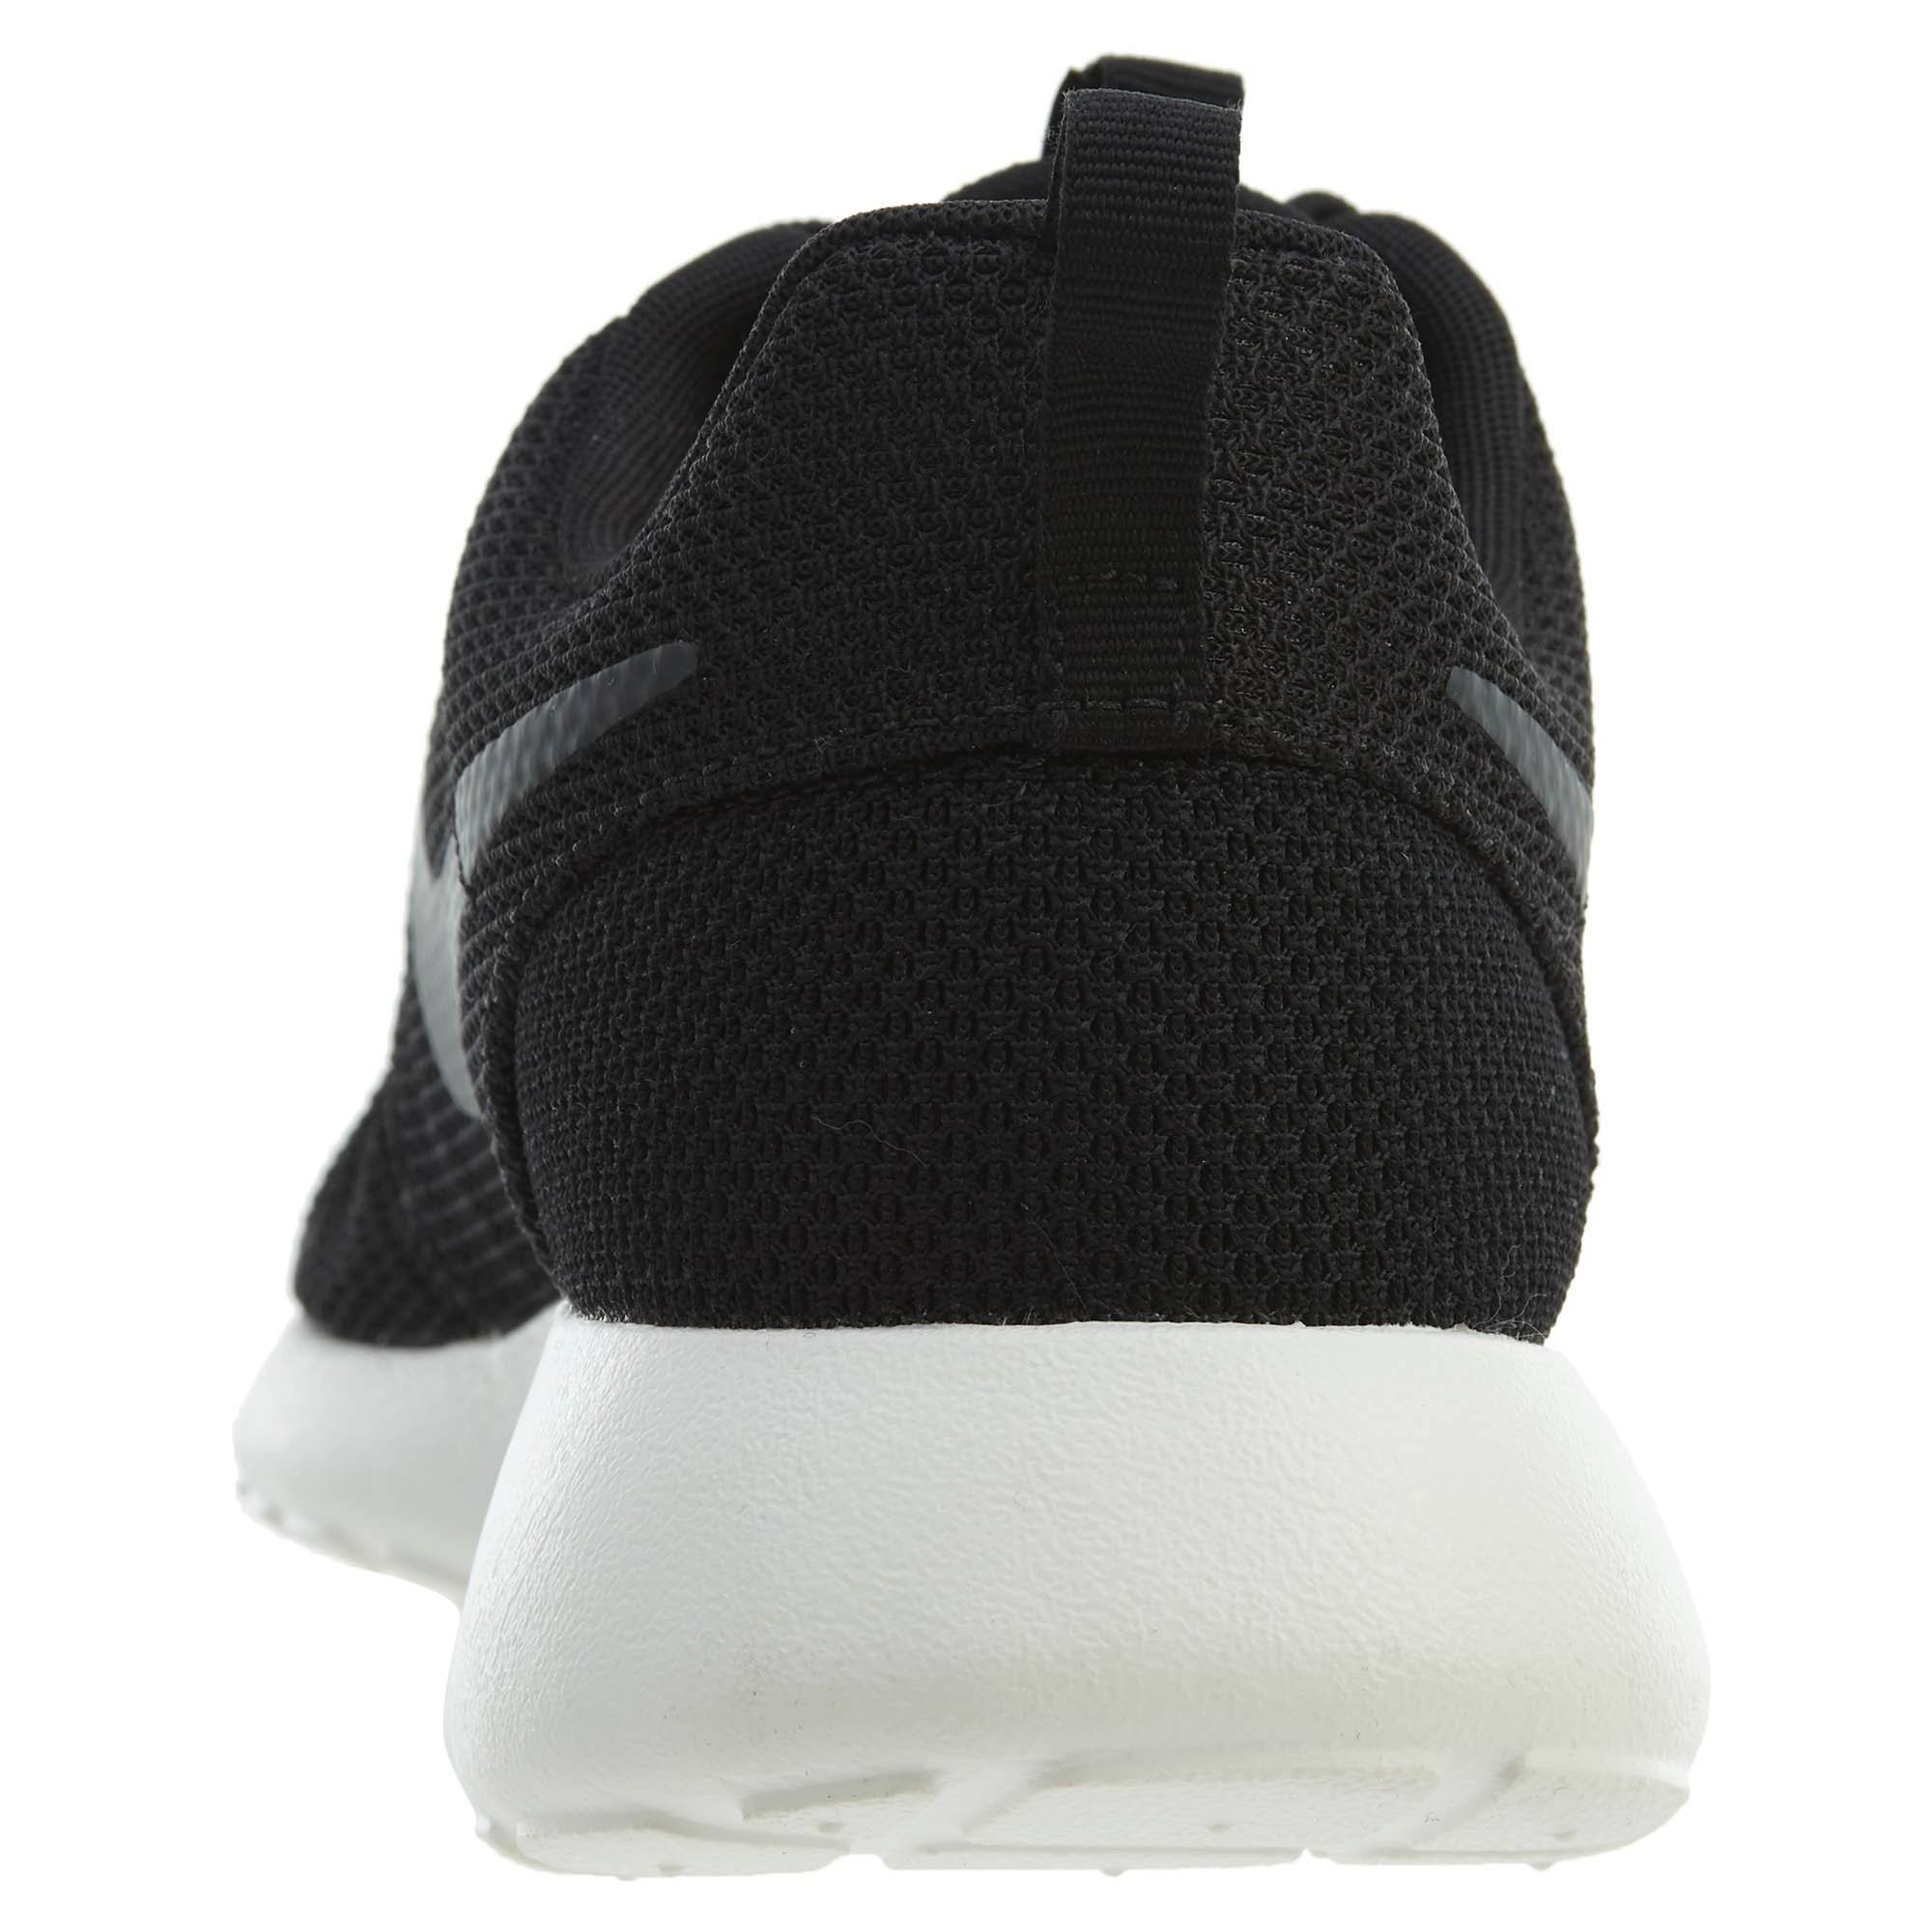 010 Roshe Nike One vela Antracita 10us Black 511881 Sz Pqwqdr8